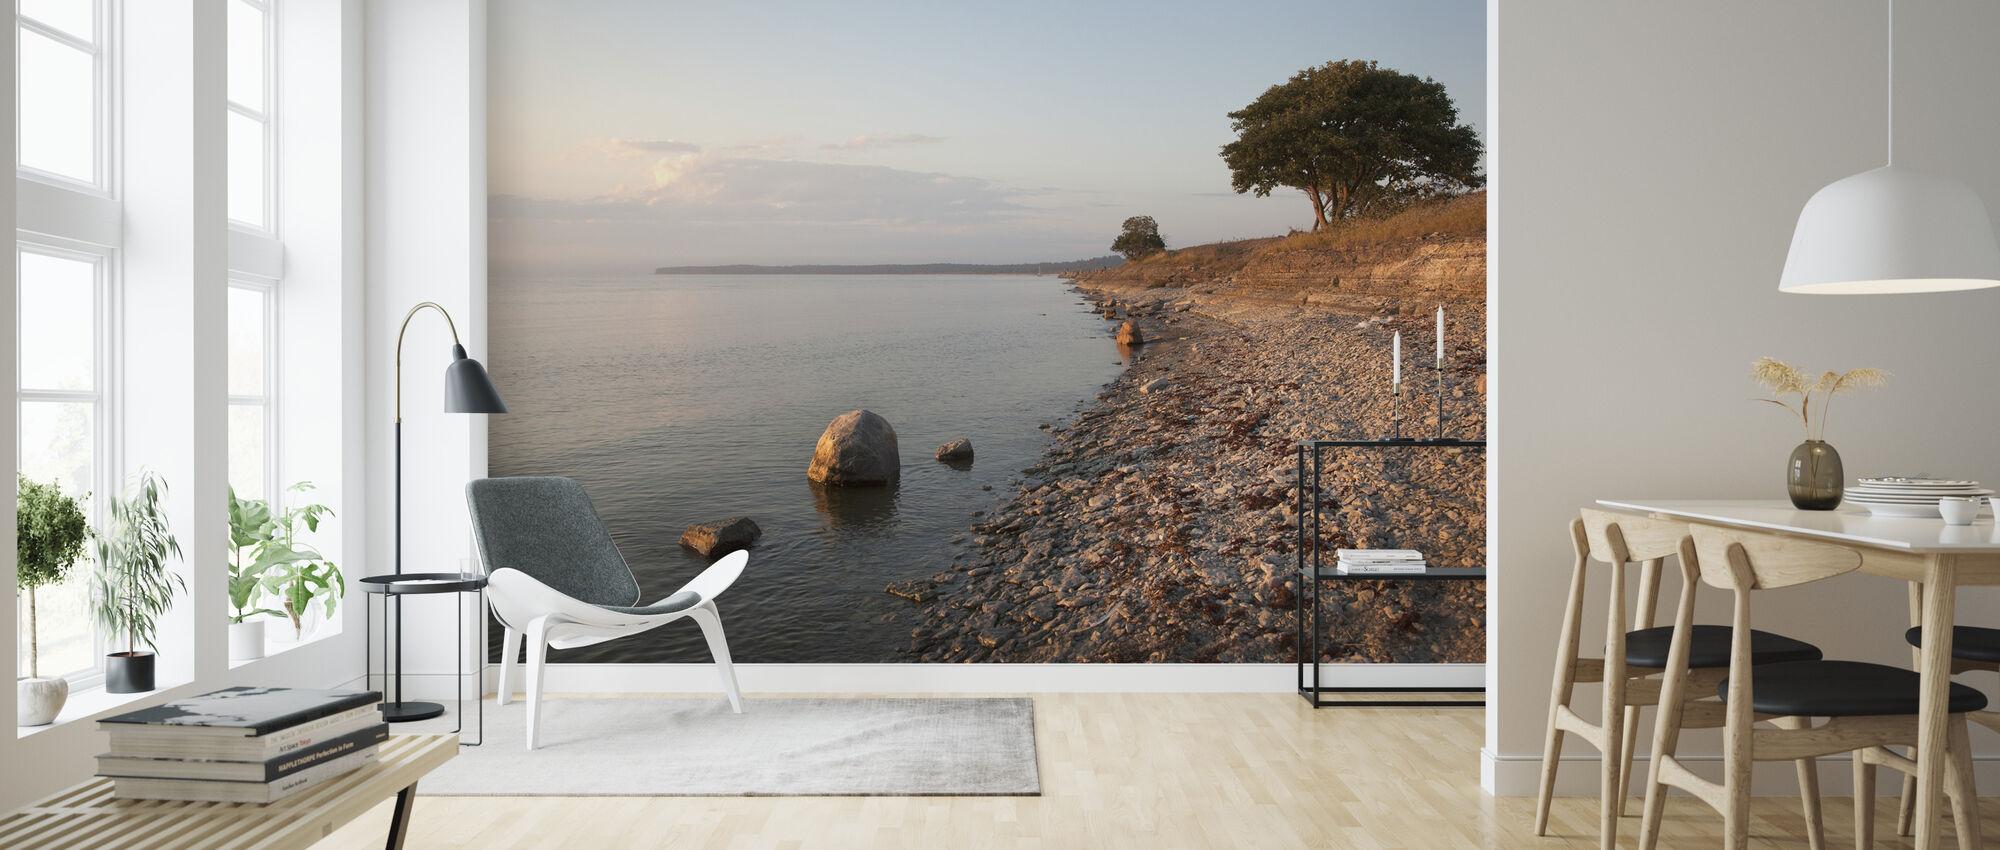 Öland Shore, Sweden - Wallpaper - Living Room